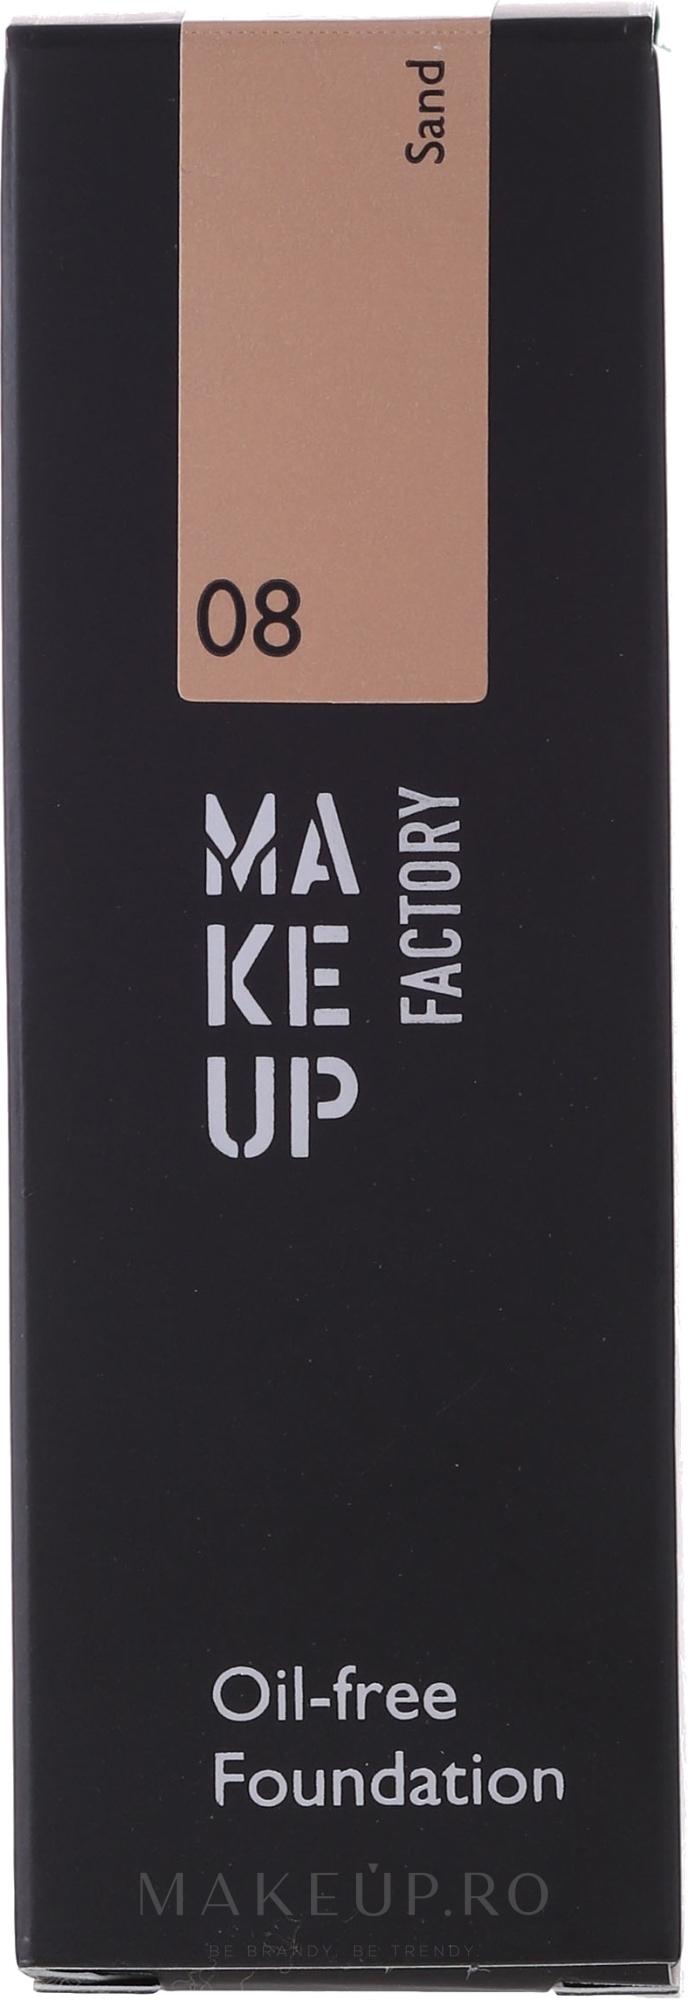 Fond de ten - Make Up Factory Oil Free Foundation — Imagine 08-Sand